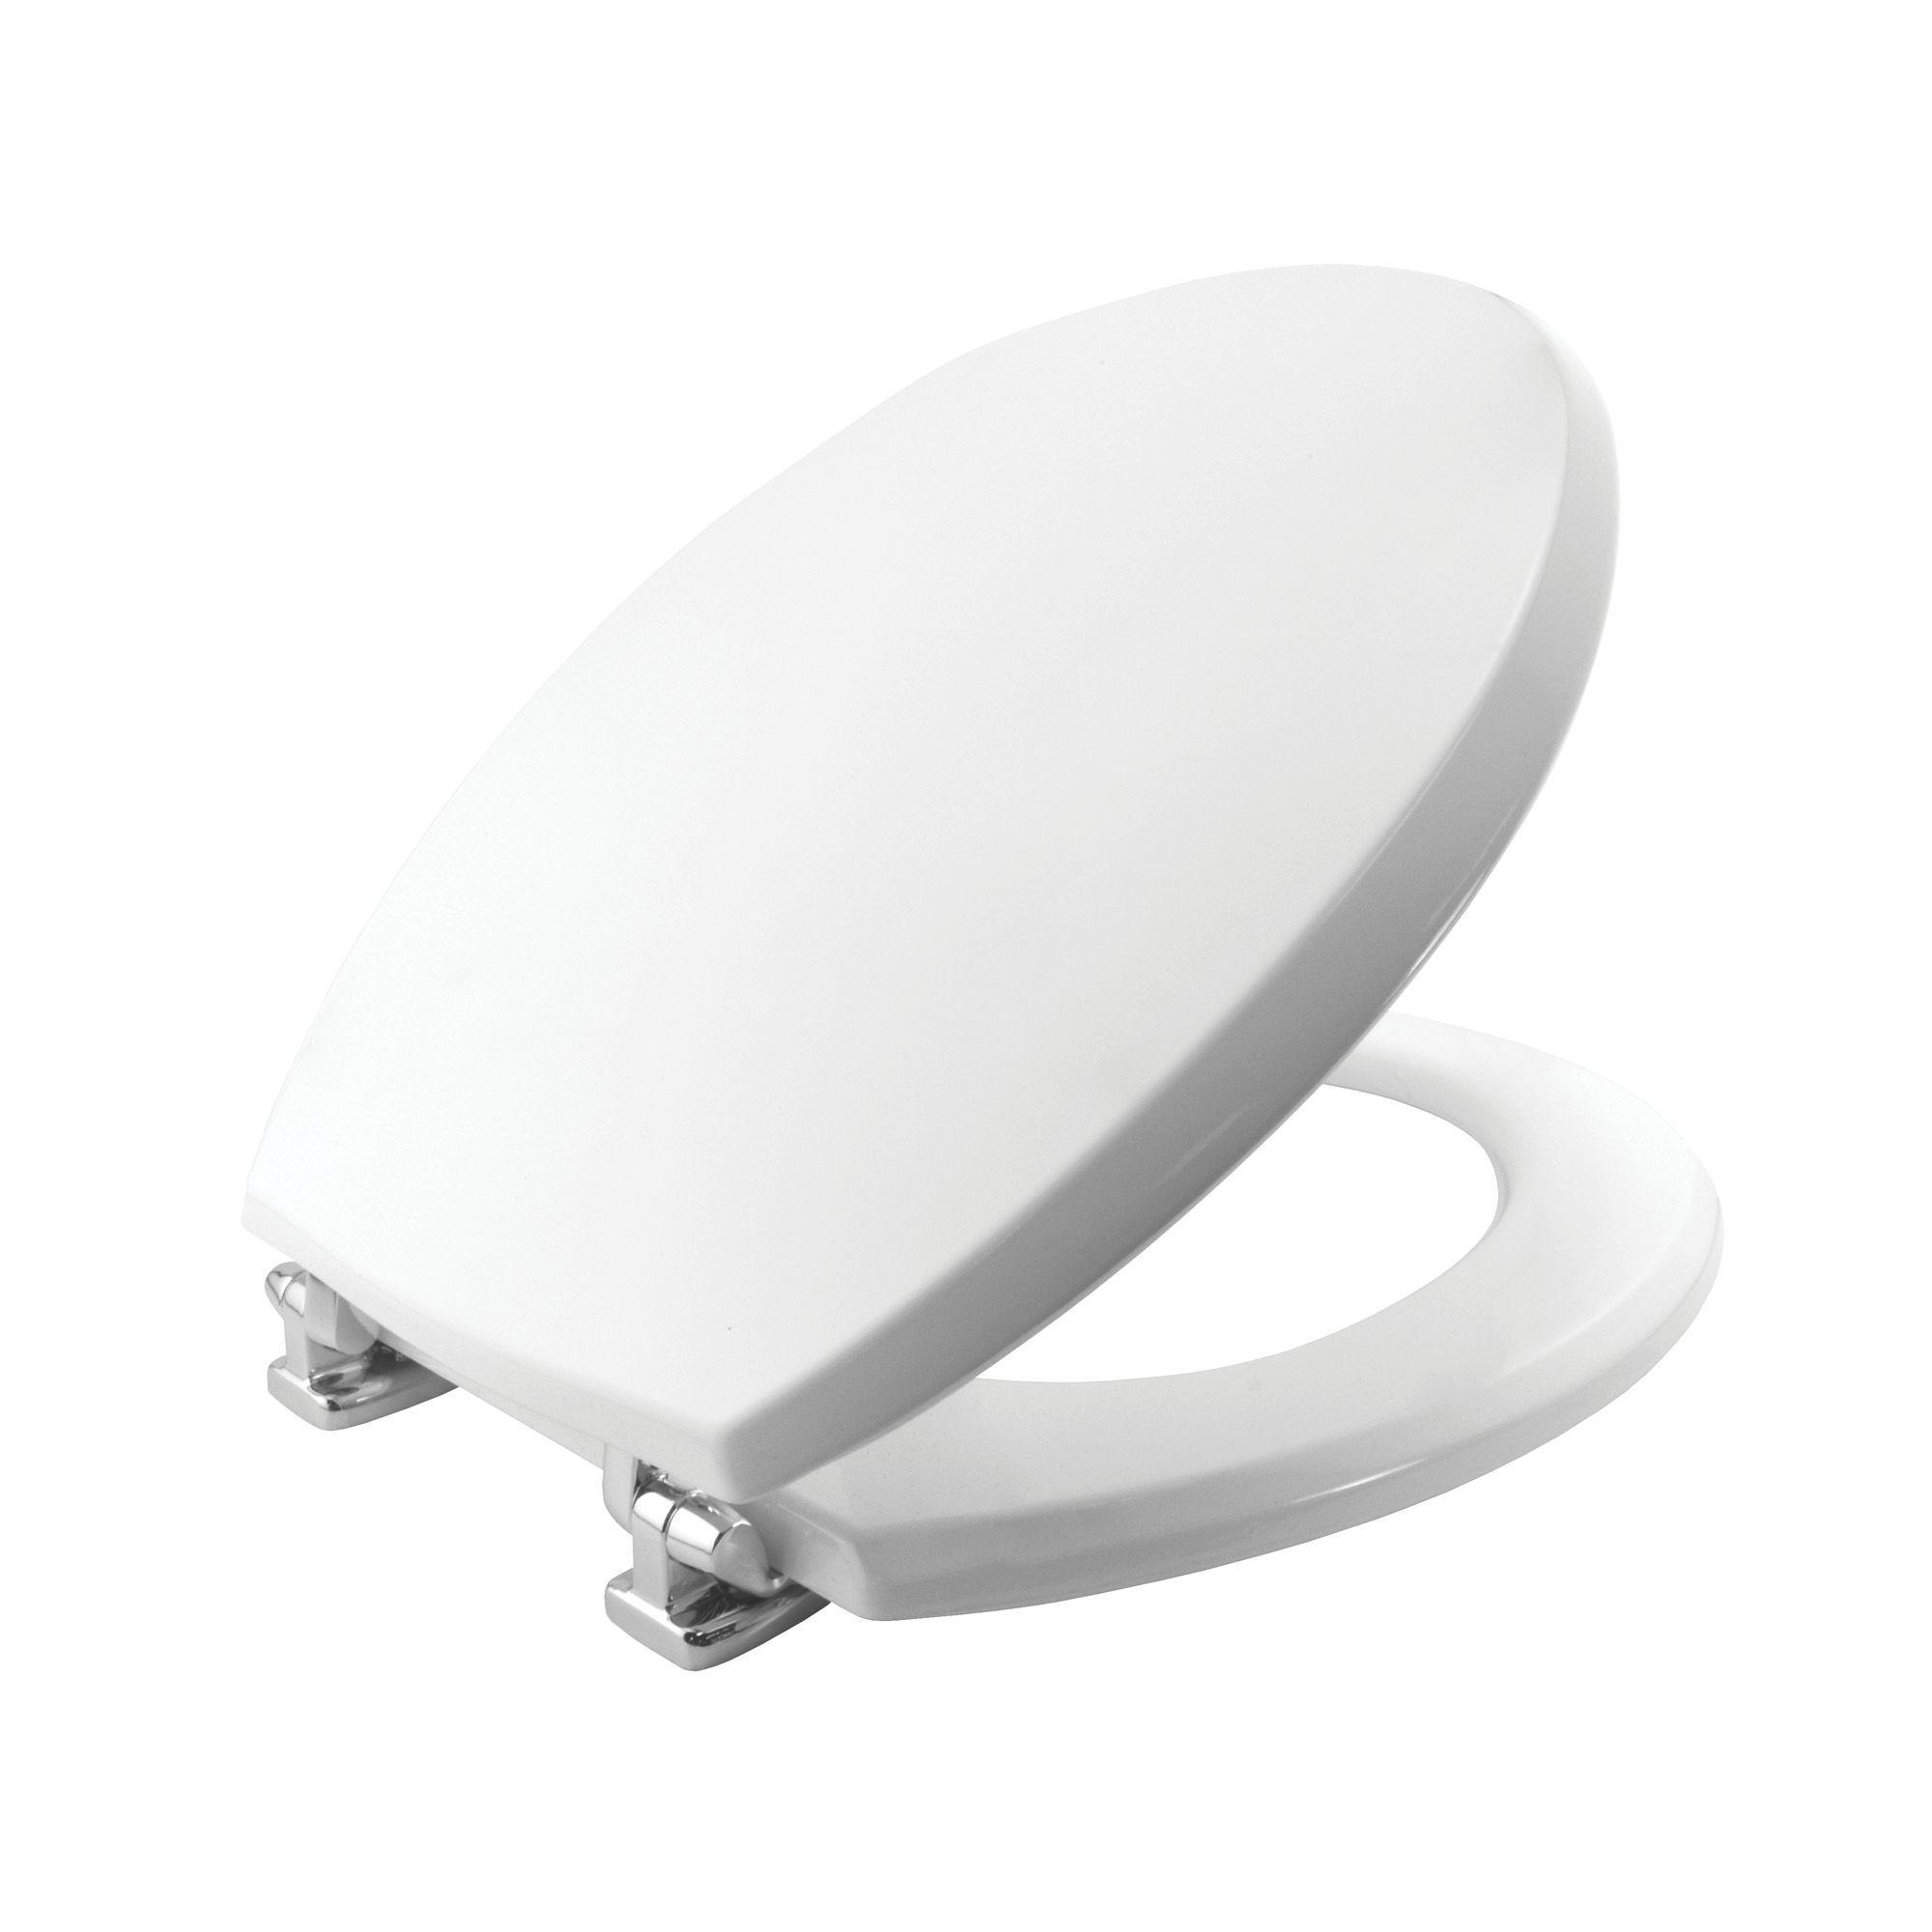 Bemis Denver White Toilet Seat Departments DIY At BQ - Bemis white toilet seat